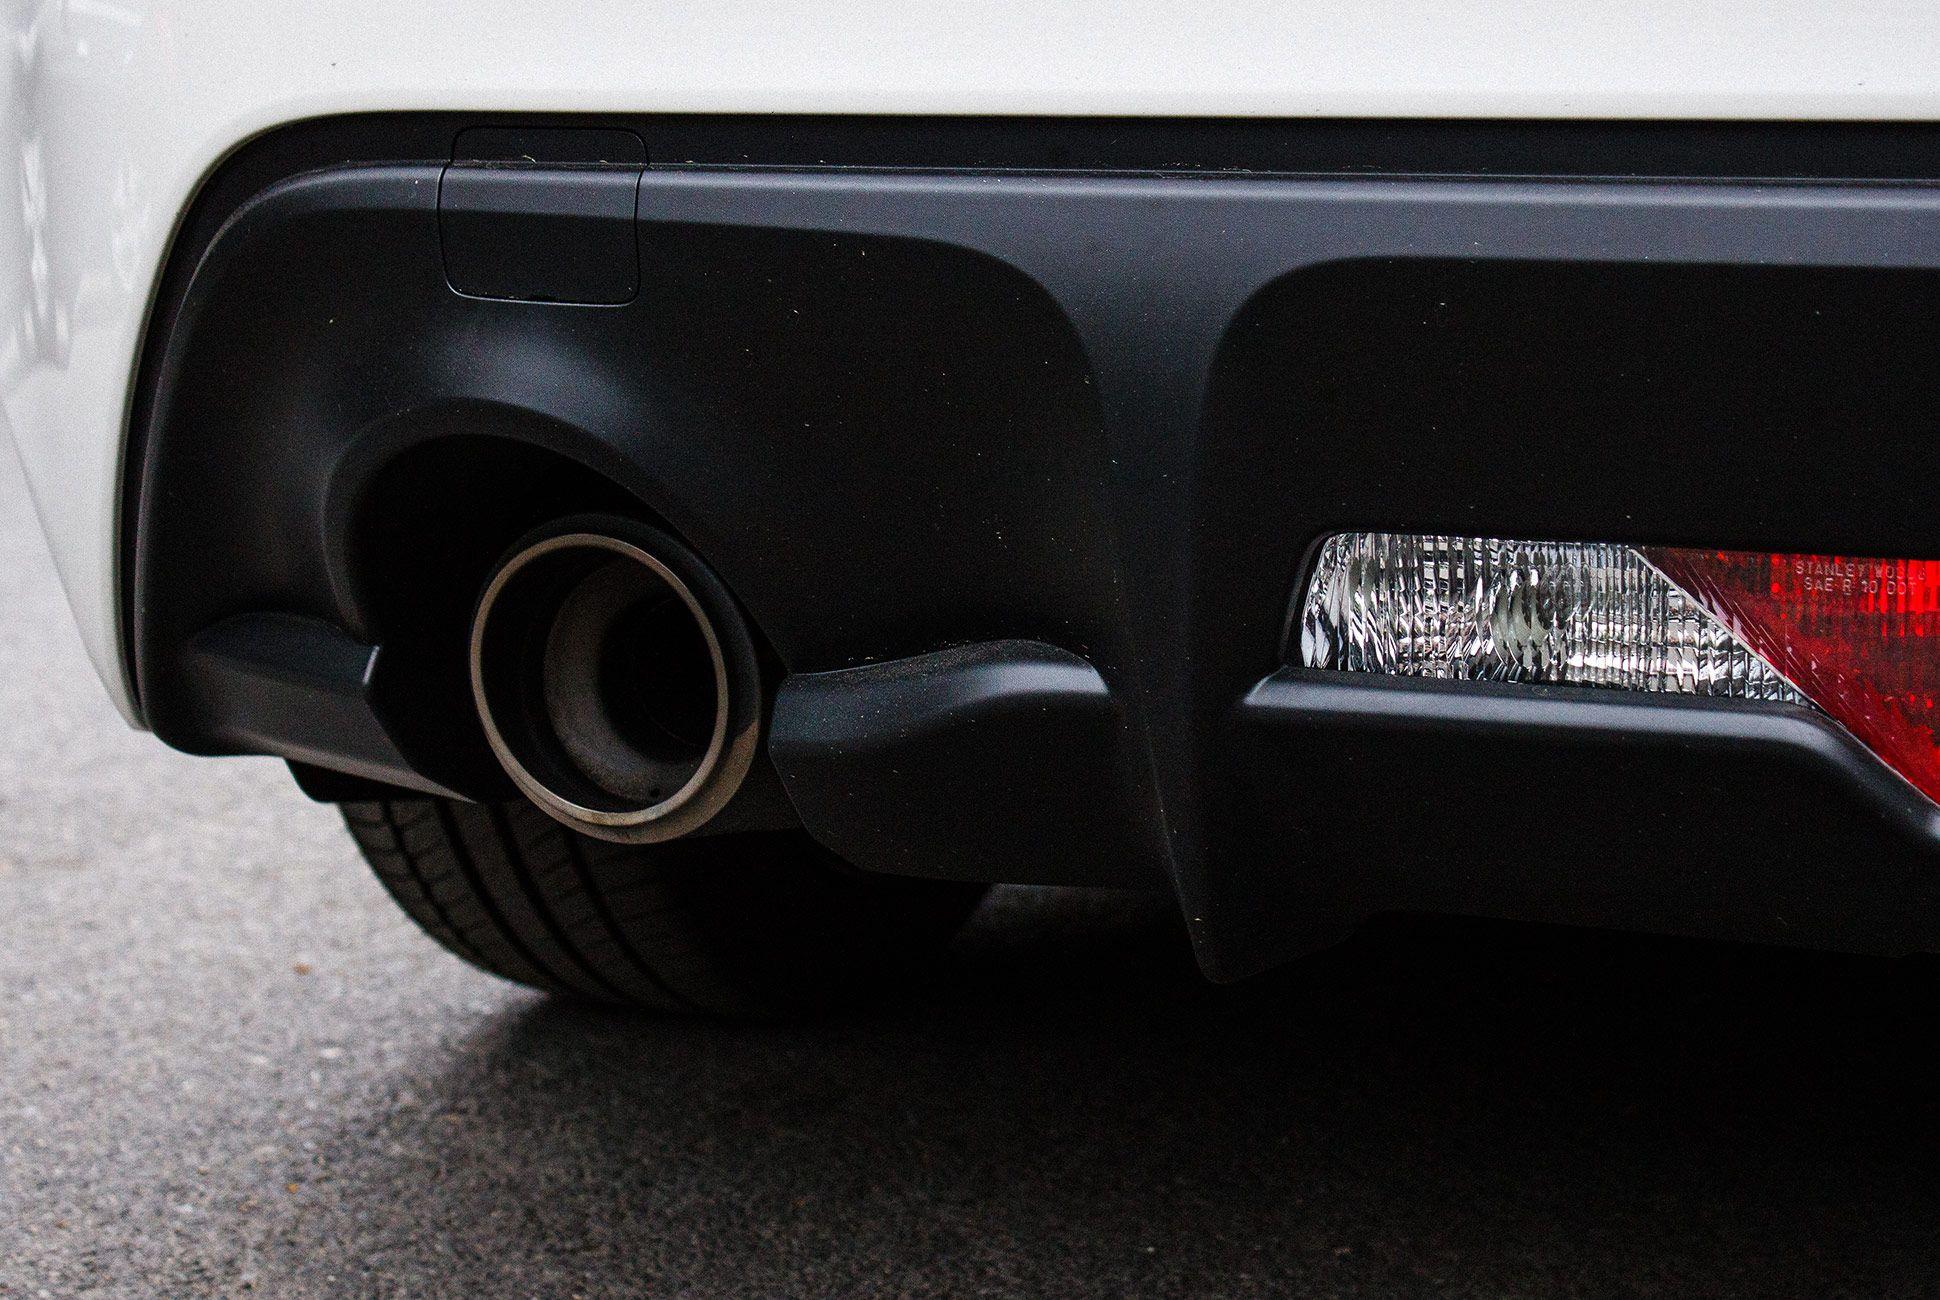 Toyota-86-GT-Black-Review-gear-patrol-slide-5